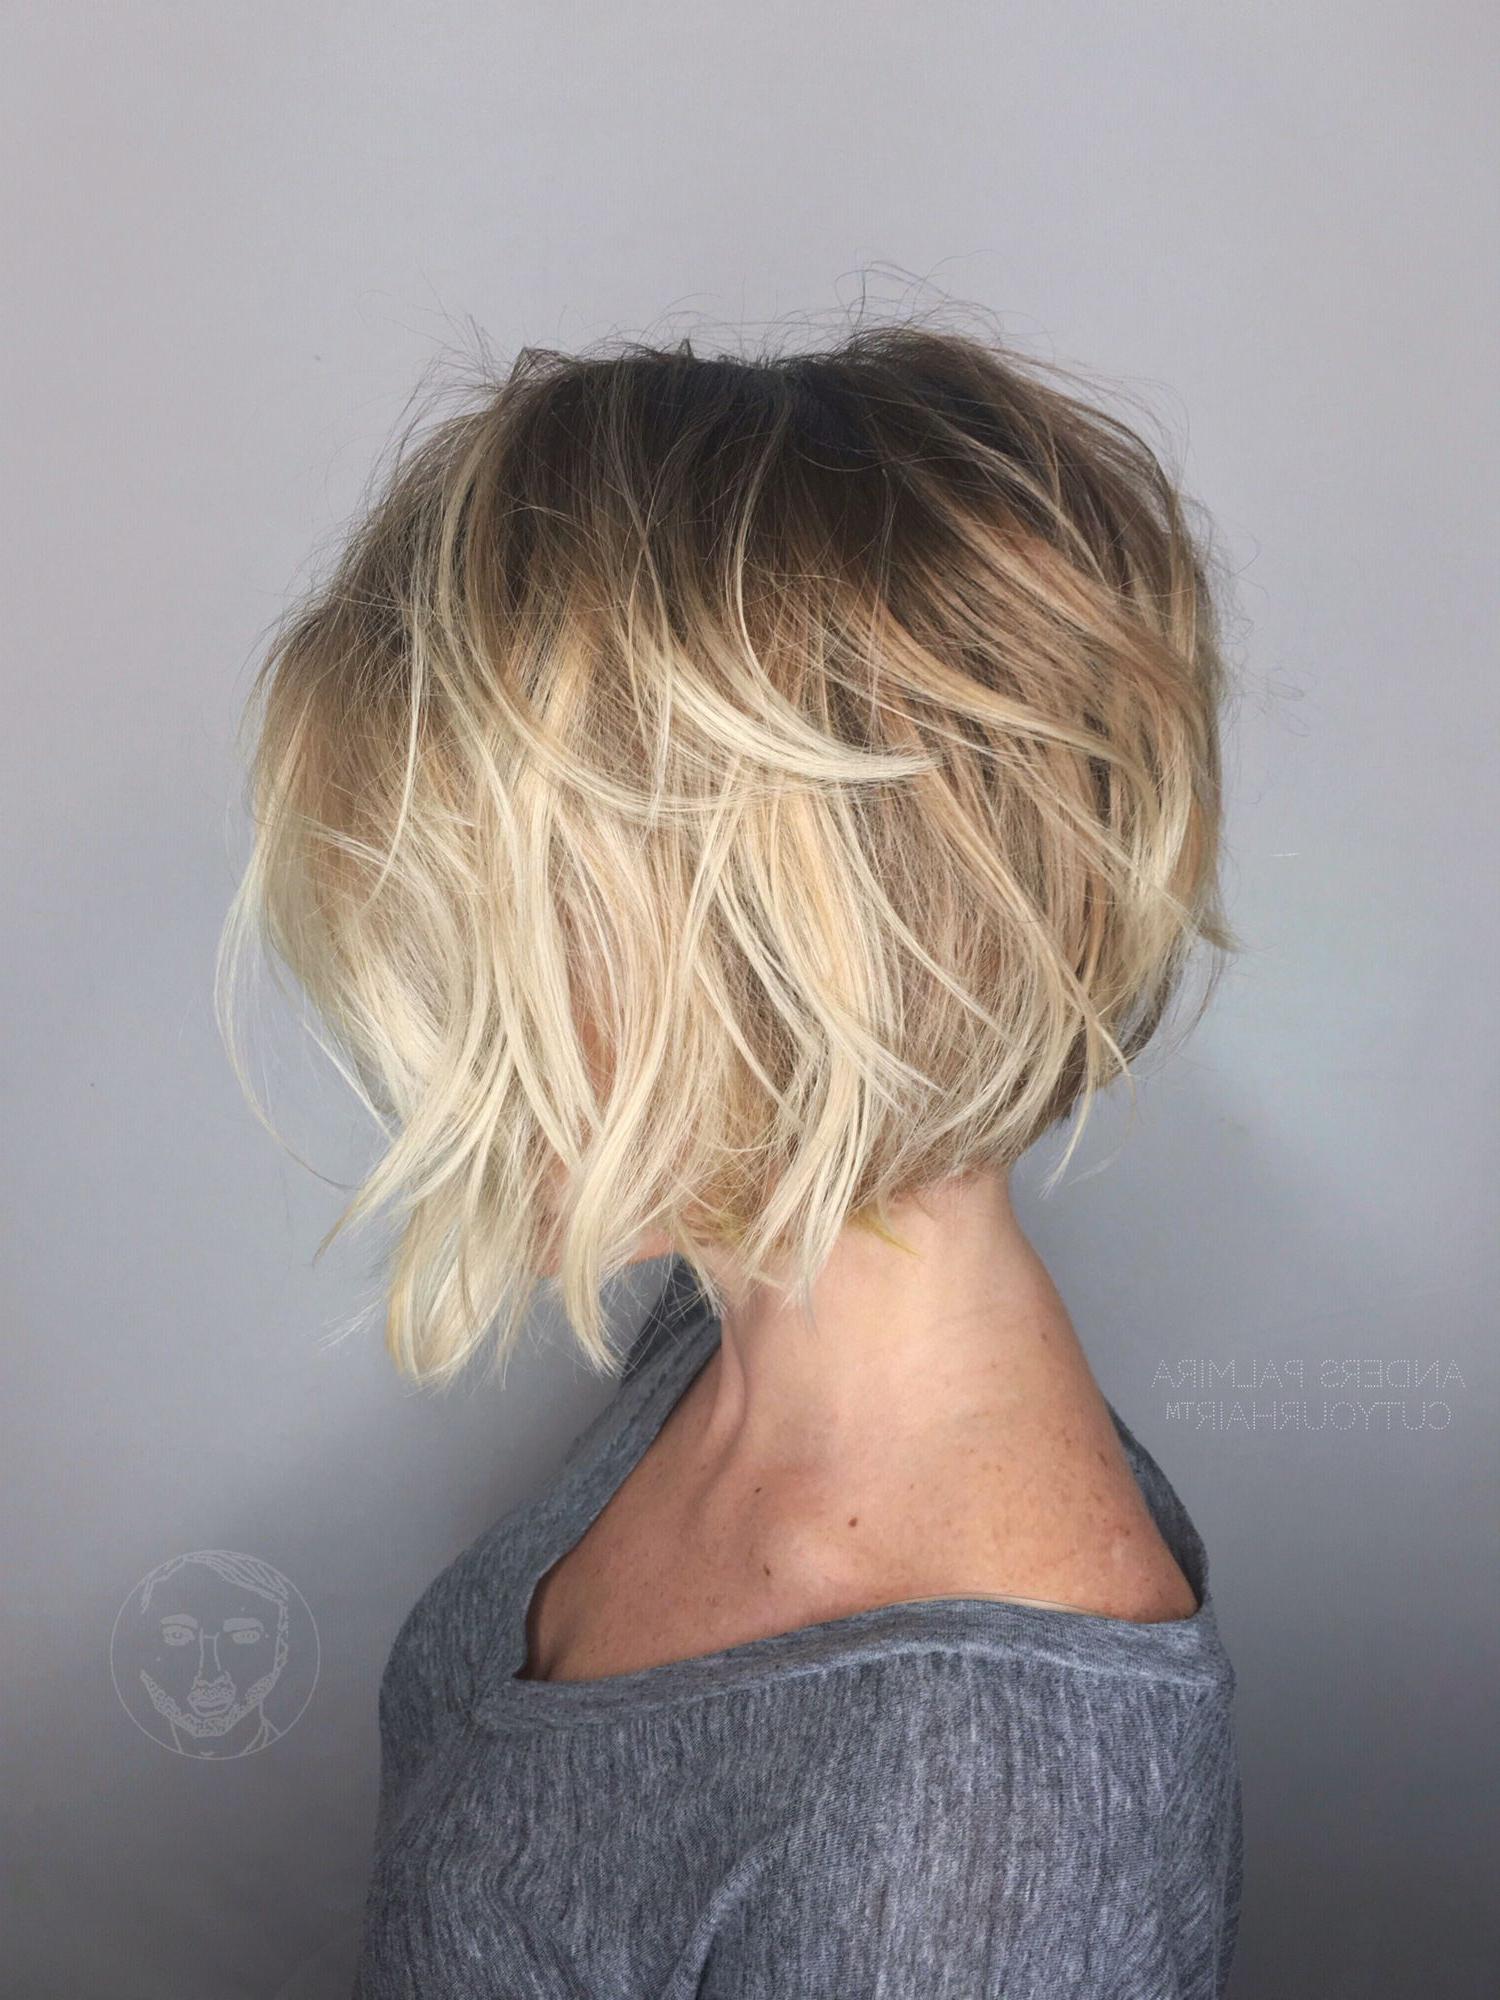 Aveda Wavy Long Blonde Bob Short Hair Beach Wave Medium Ideas Lob With Nape Length Curly Balayage Bob Hairstyles (Gallery 1 of 25)